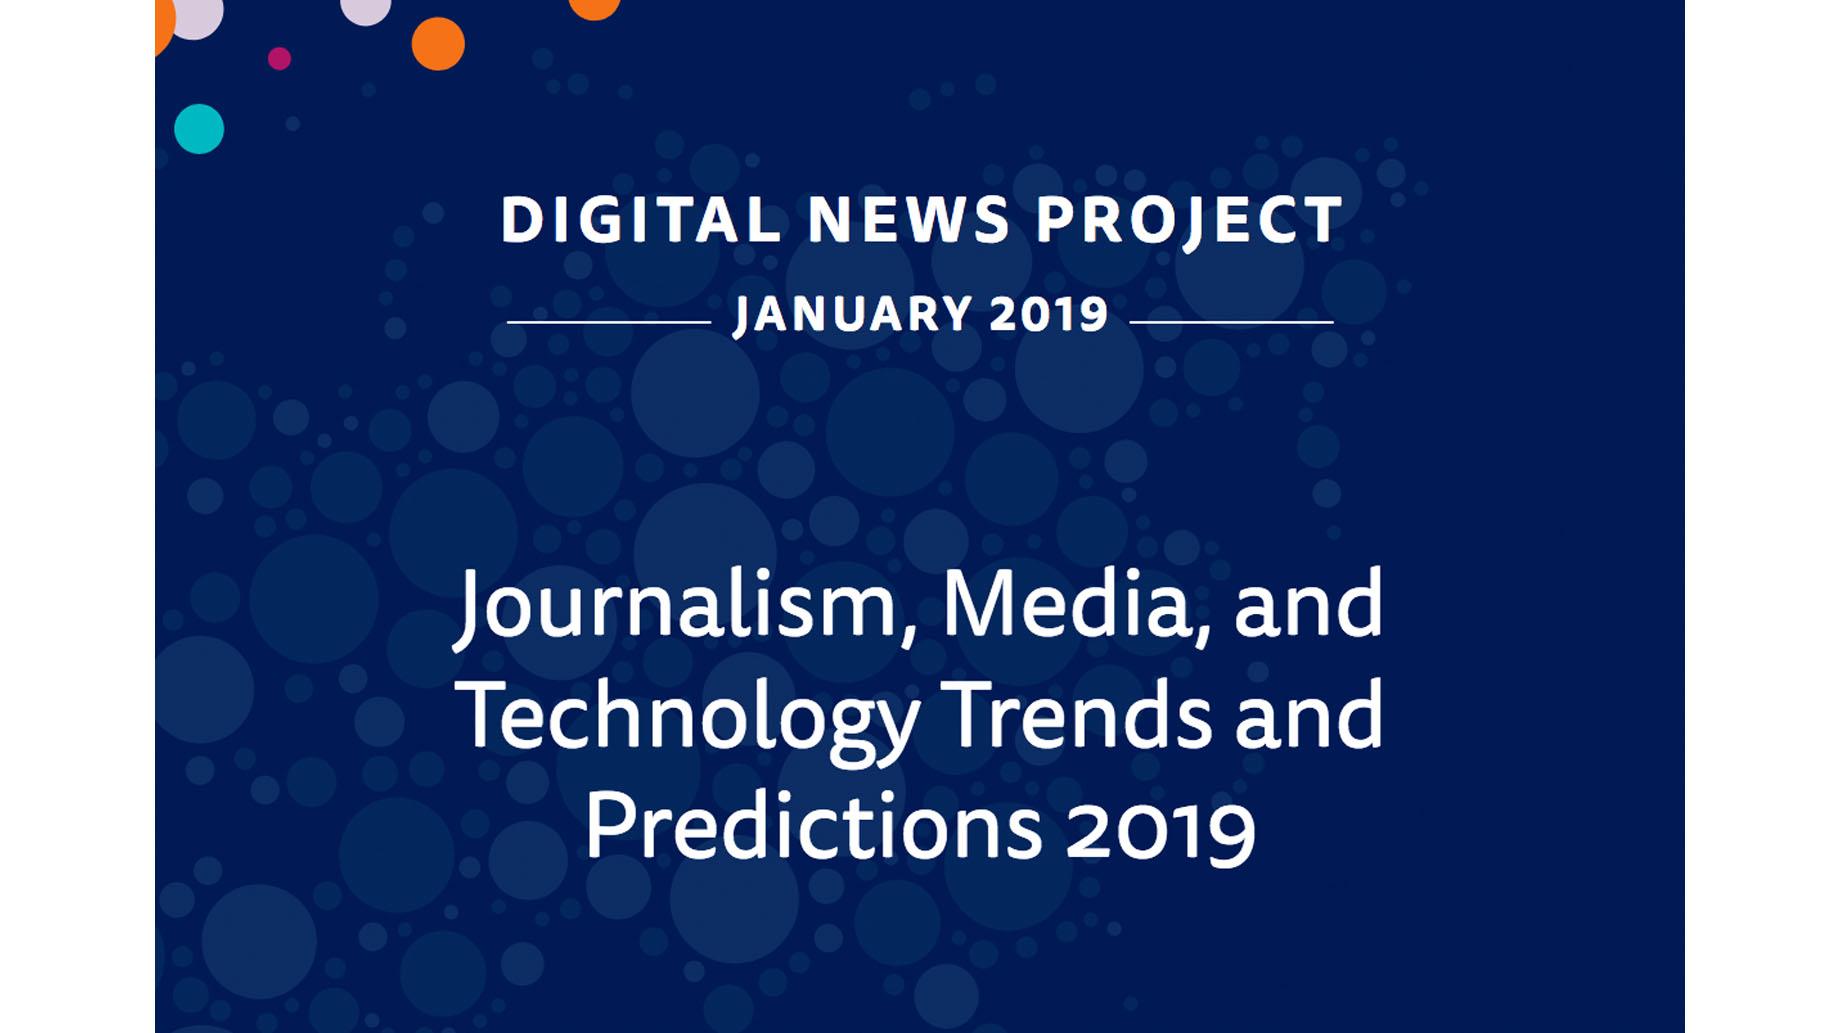 reuters-digital-news-2019-1